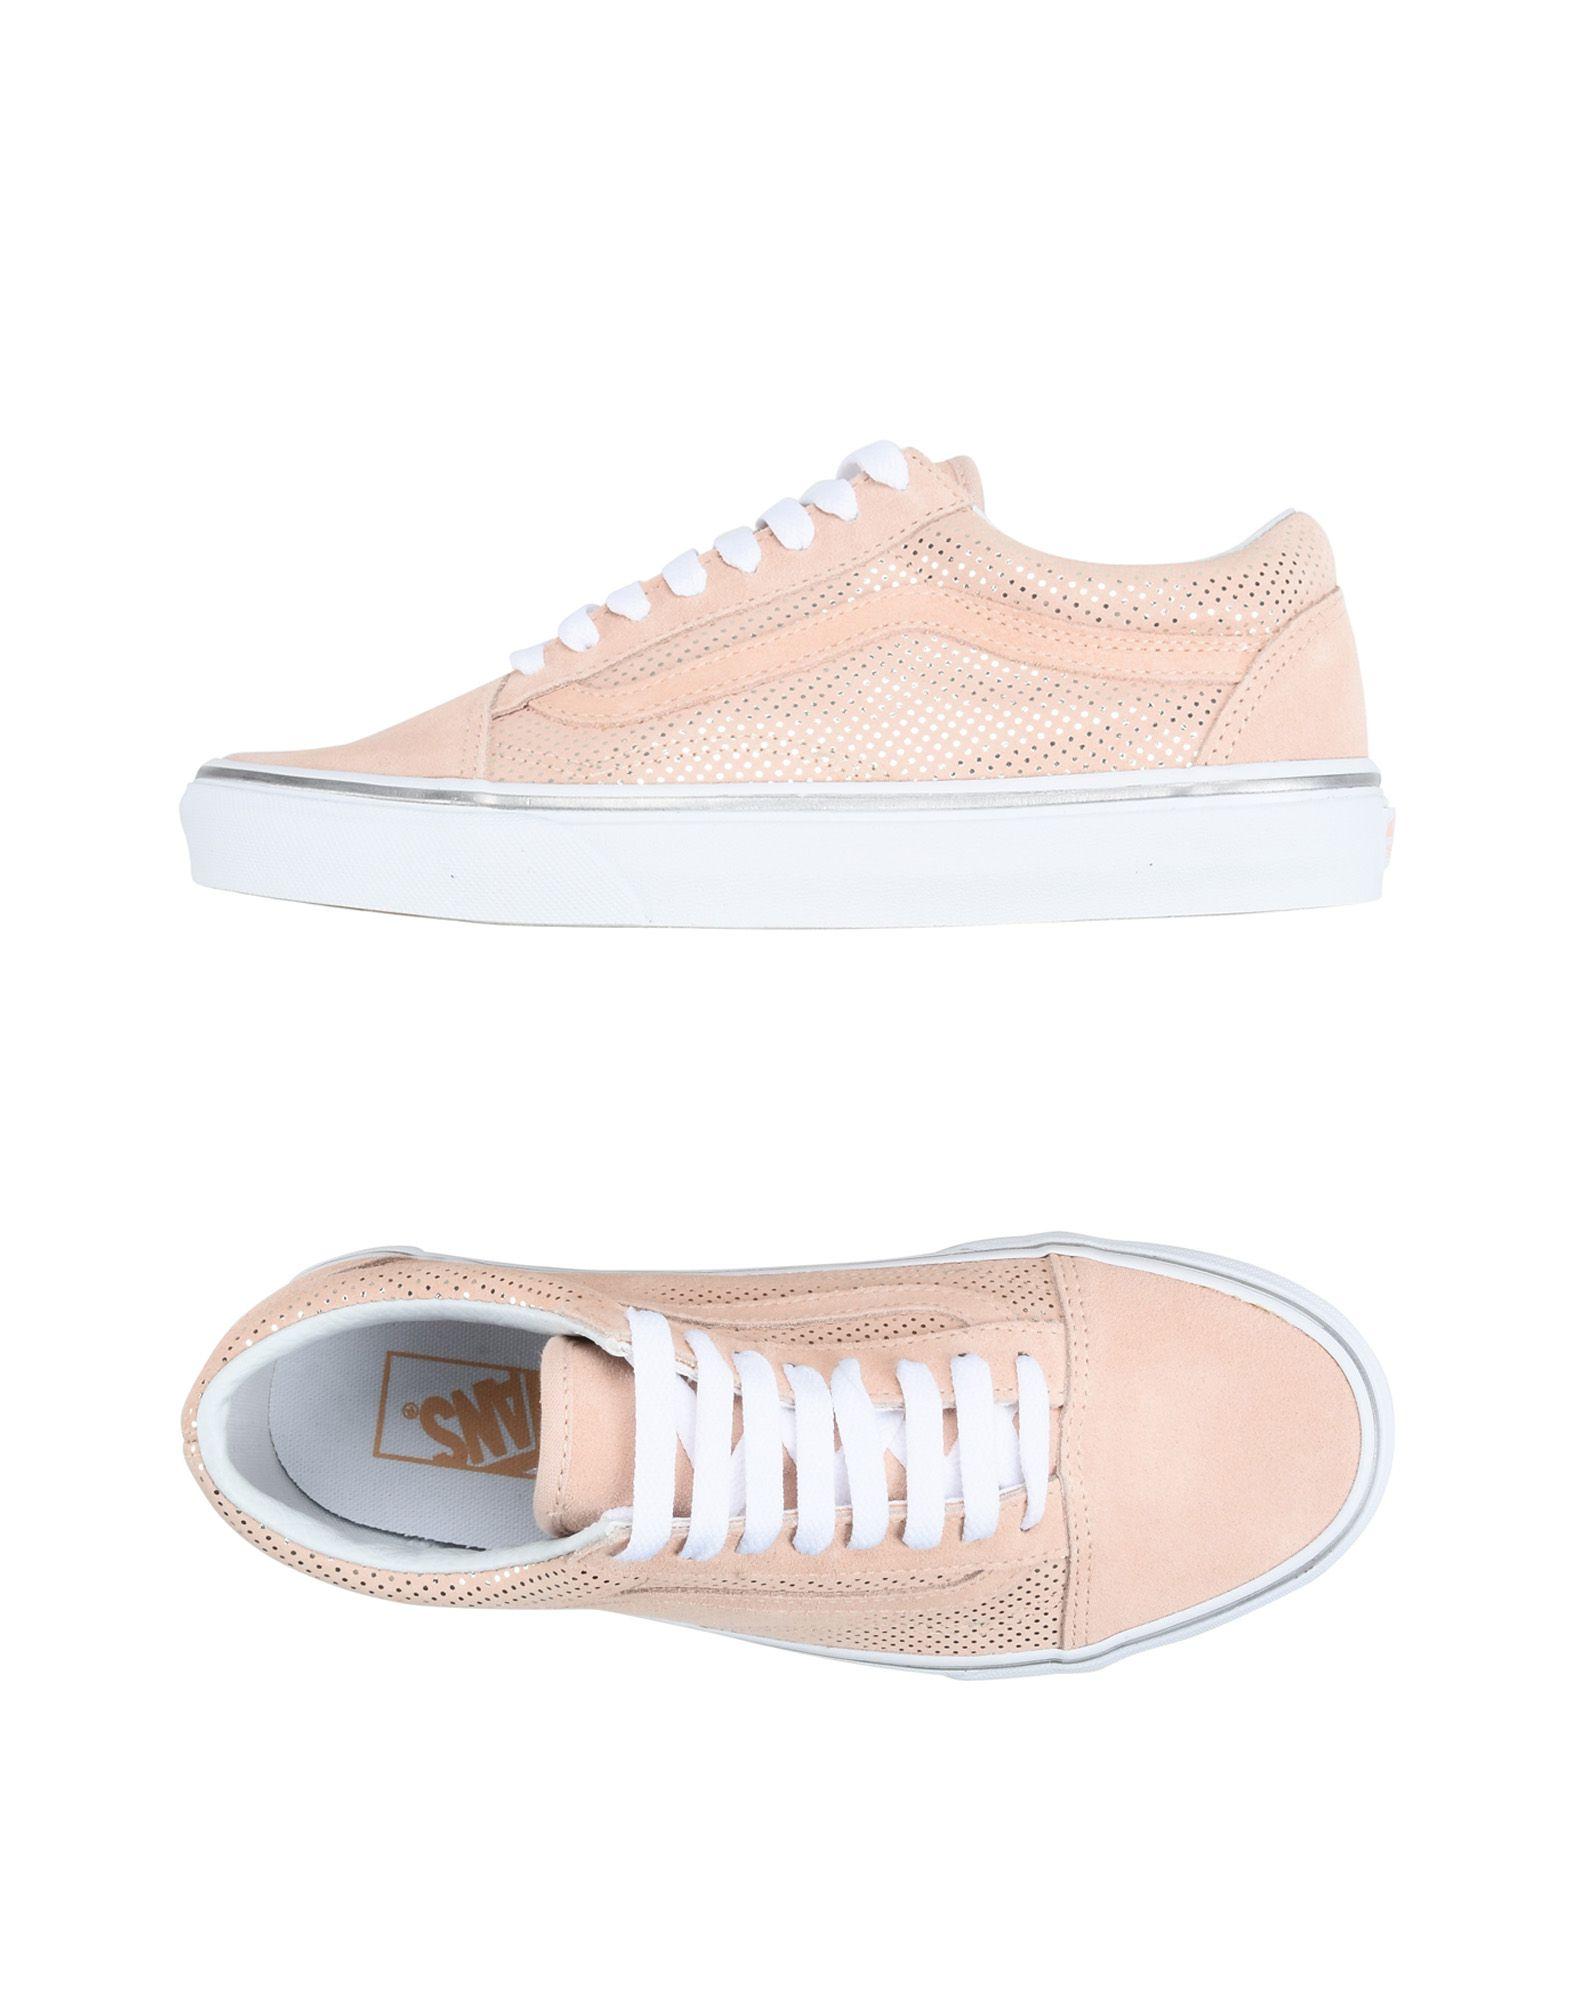 802bbecf7df Vans Ua Old Skool - Metallic Dots - Sneakers - Women Vans Sneakers ...